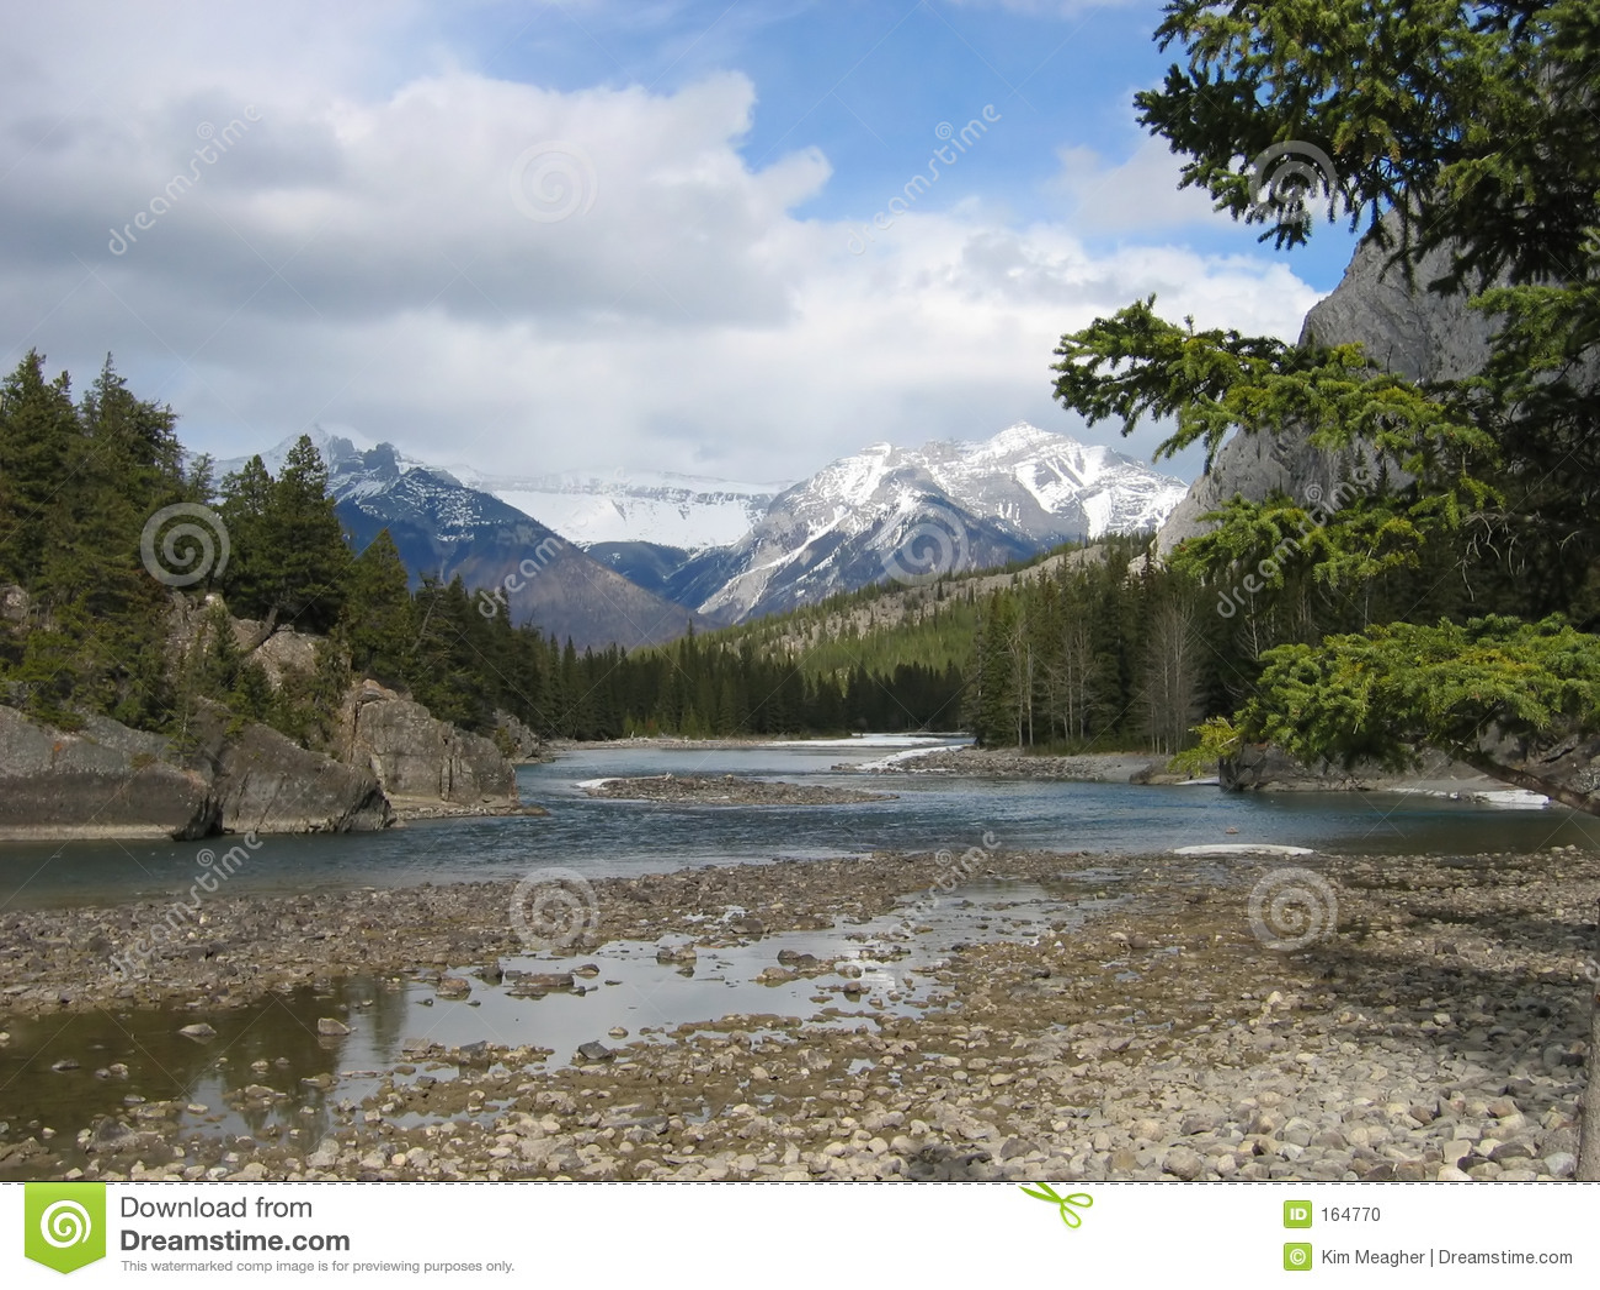 Canadian Rockies I